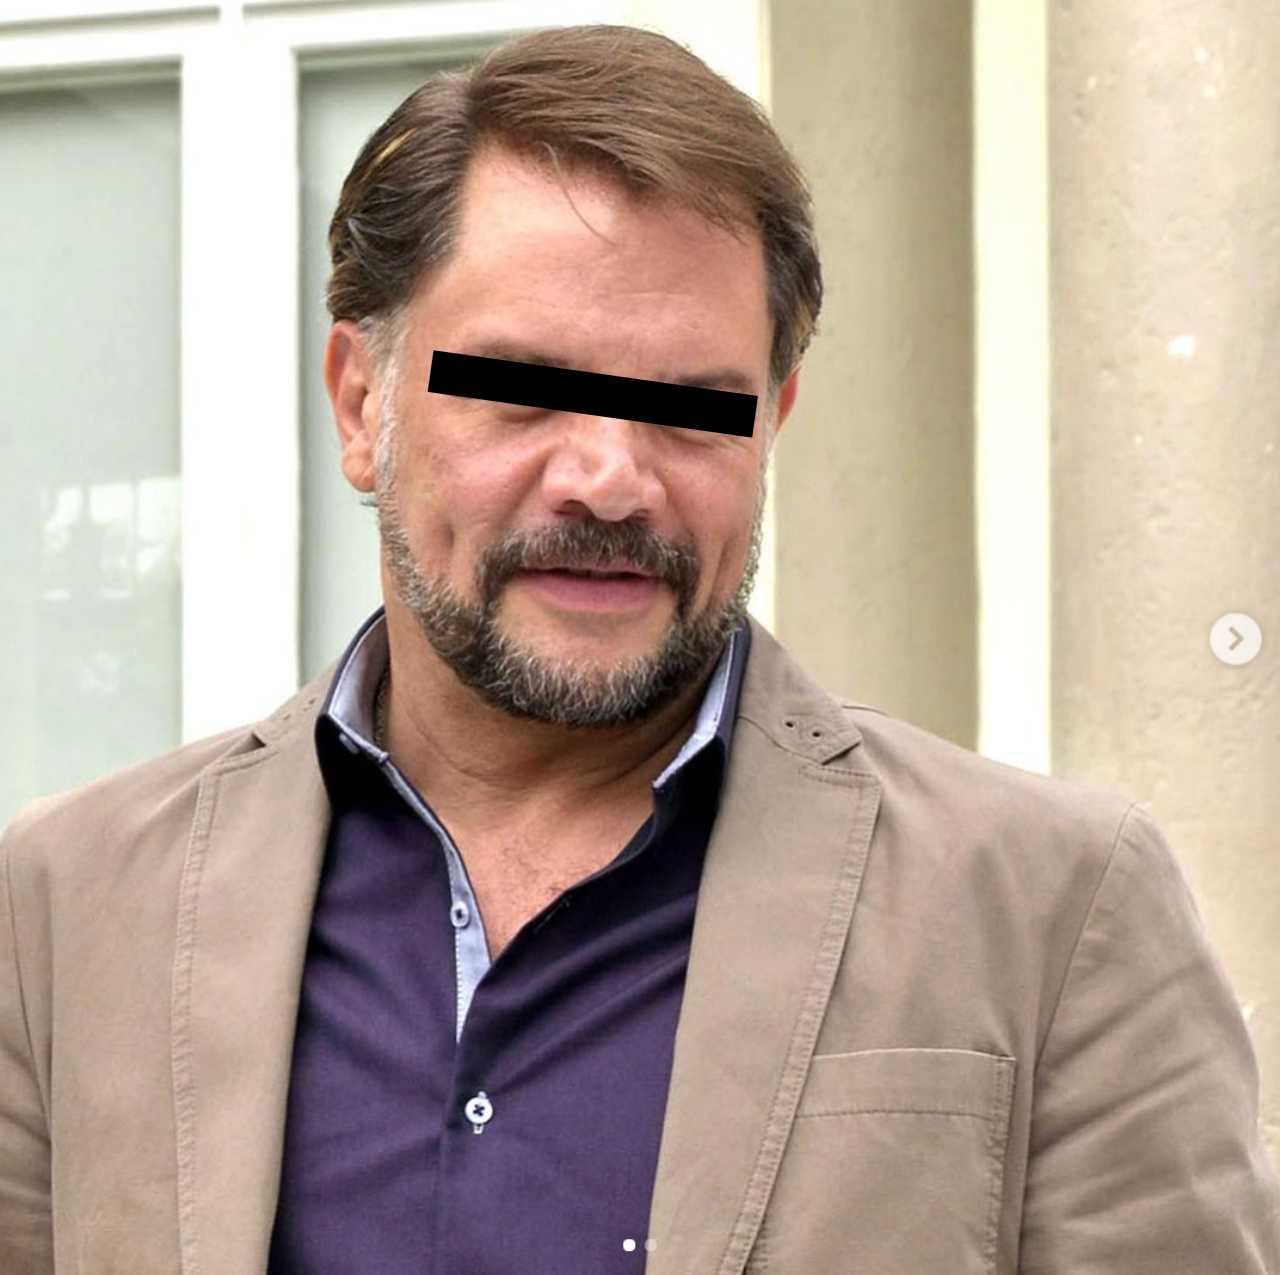 Abogado de Héctor Parra inicia demanda contra Sergio Mayer